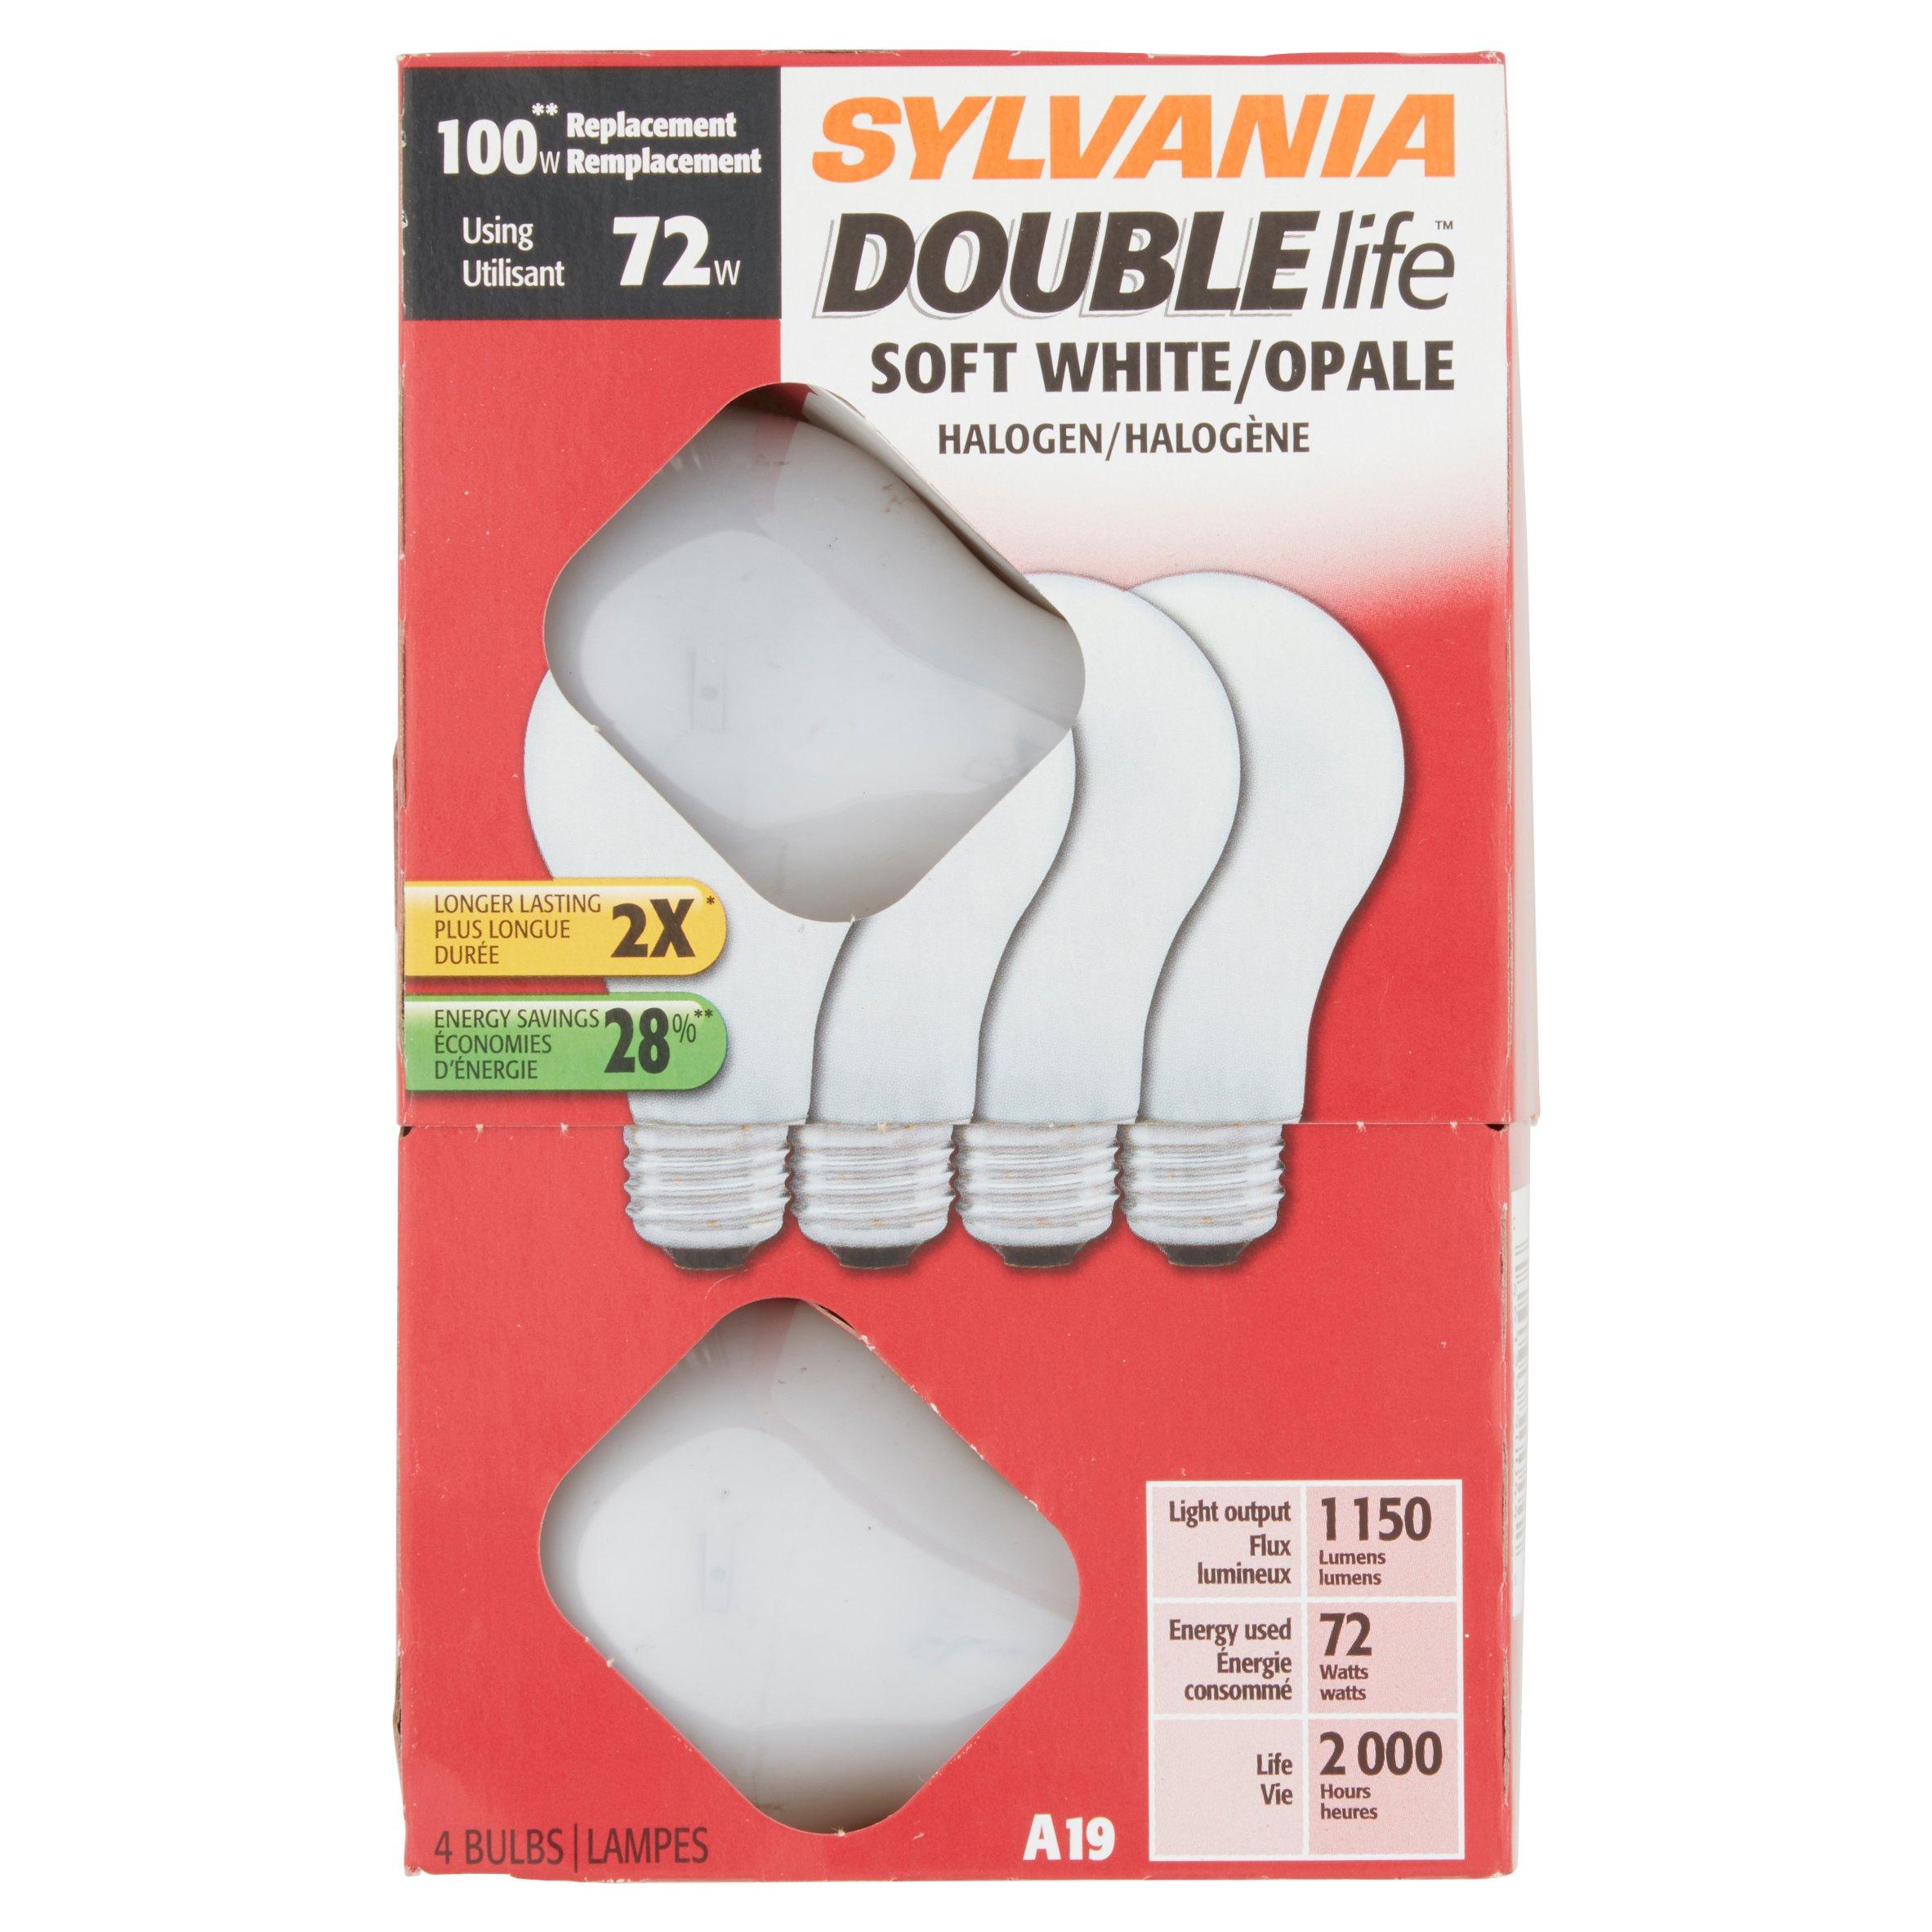 Sylvania Halogen Light Bulbs: Sylvania Double Life 72W Halogen Light Bulbs, Soft White, 4-Pack -  Walmart.com,Lighting